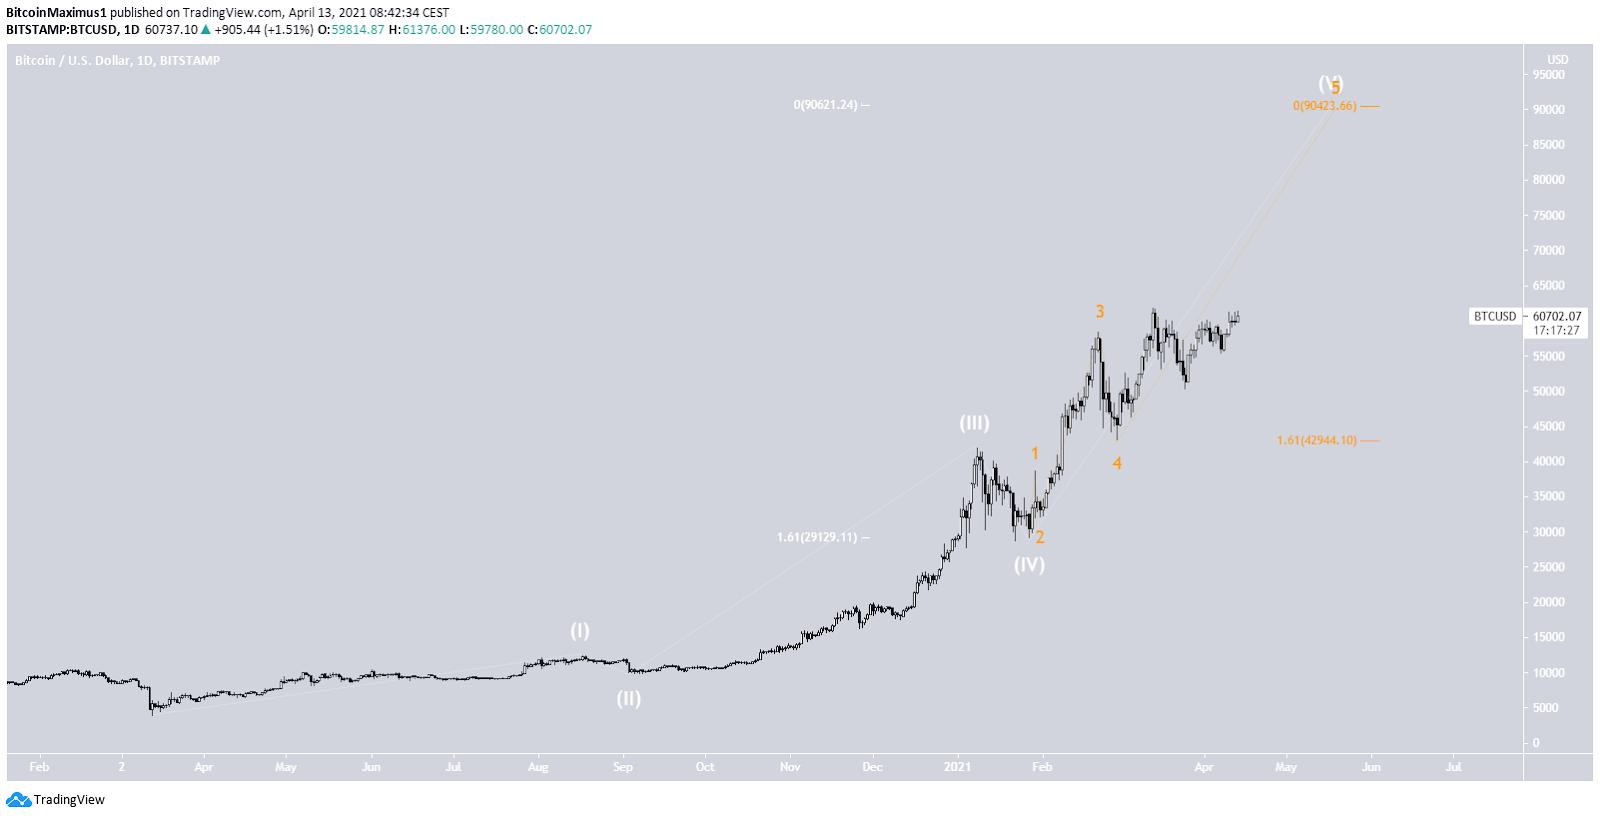 Bitcoin Kurs Wellenanalyse langfristig 13.04.2021